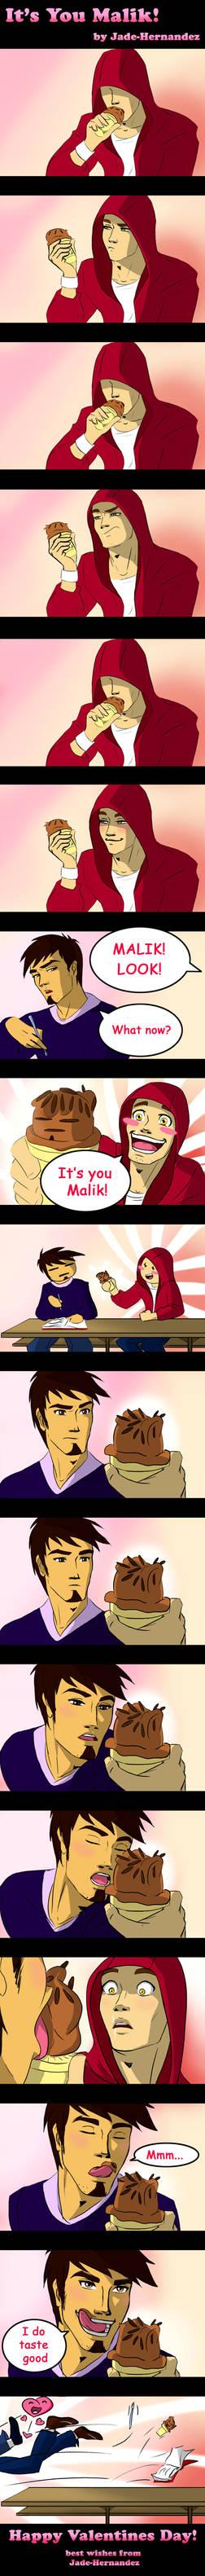 It's you Malik